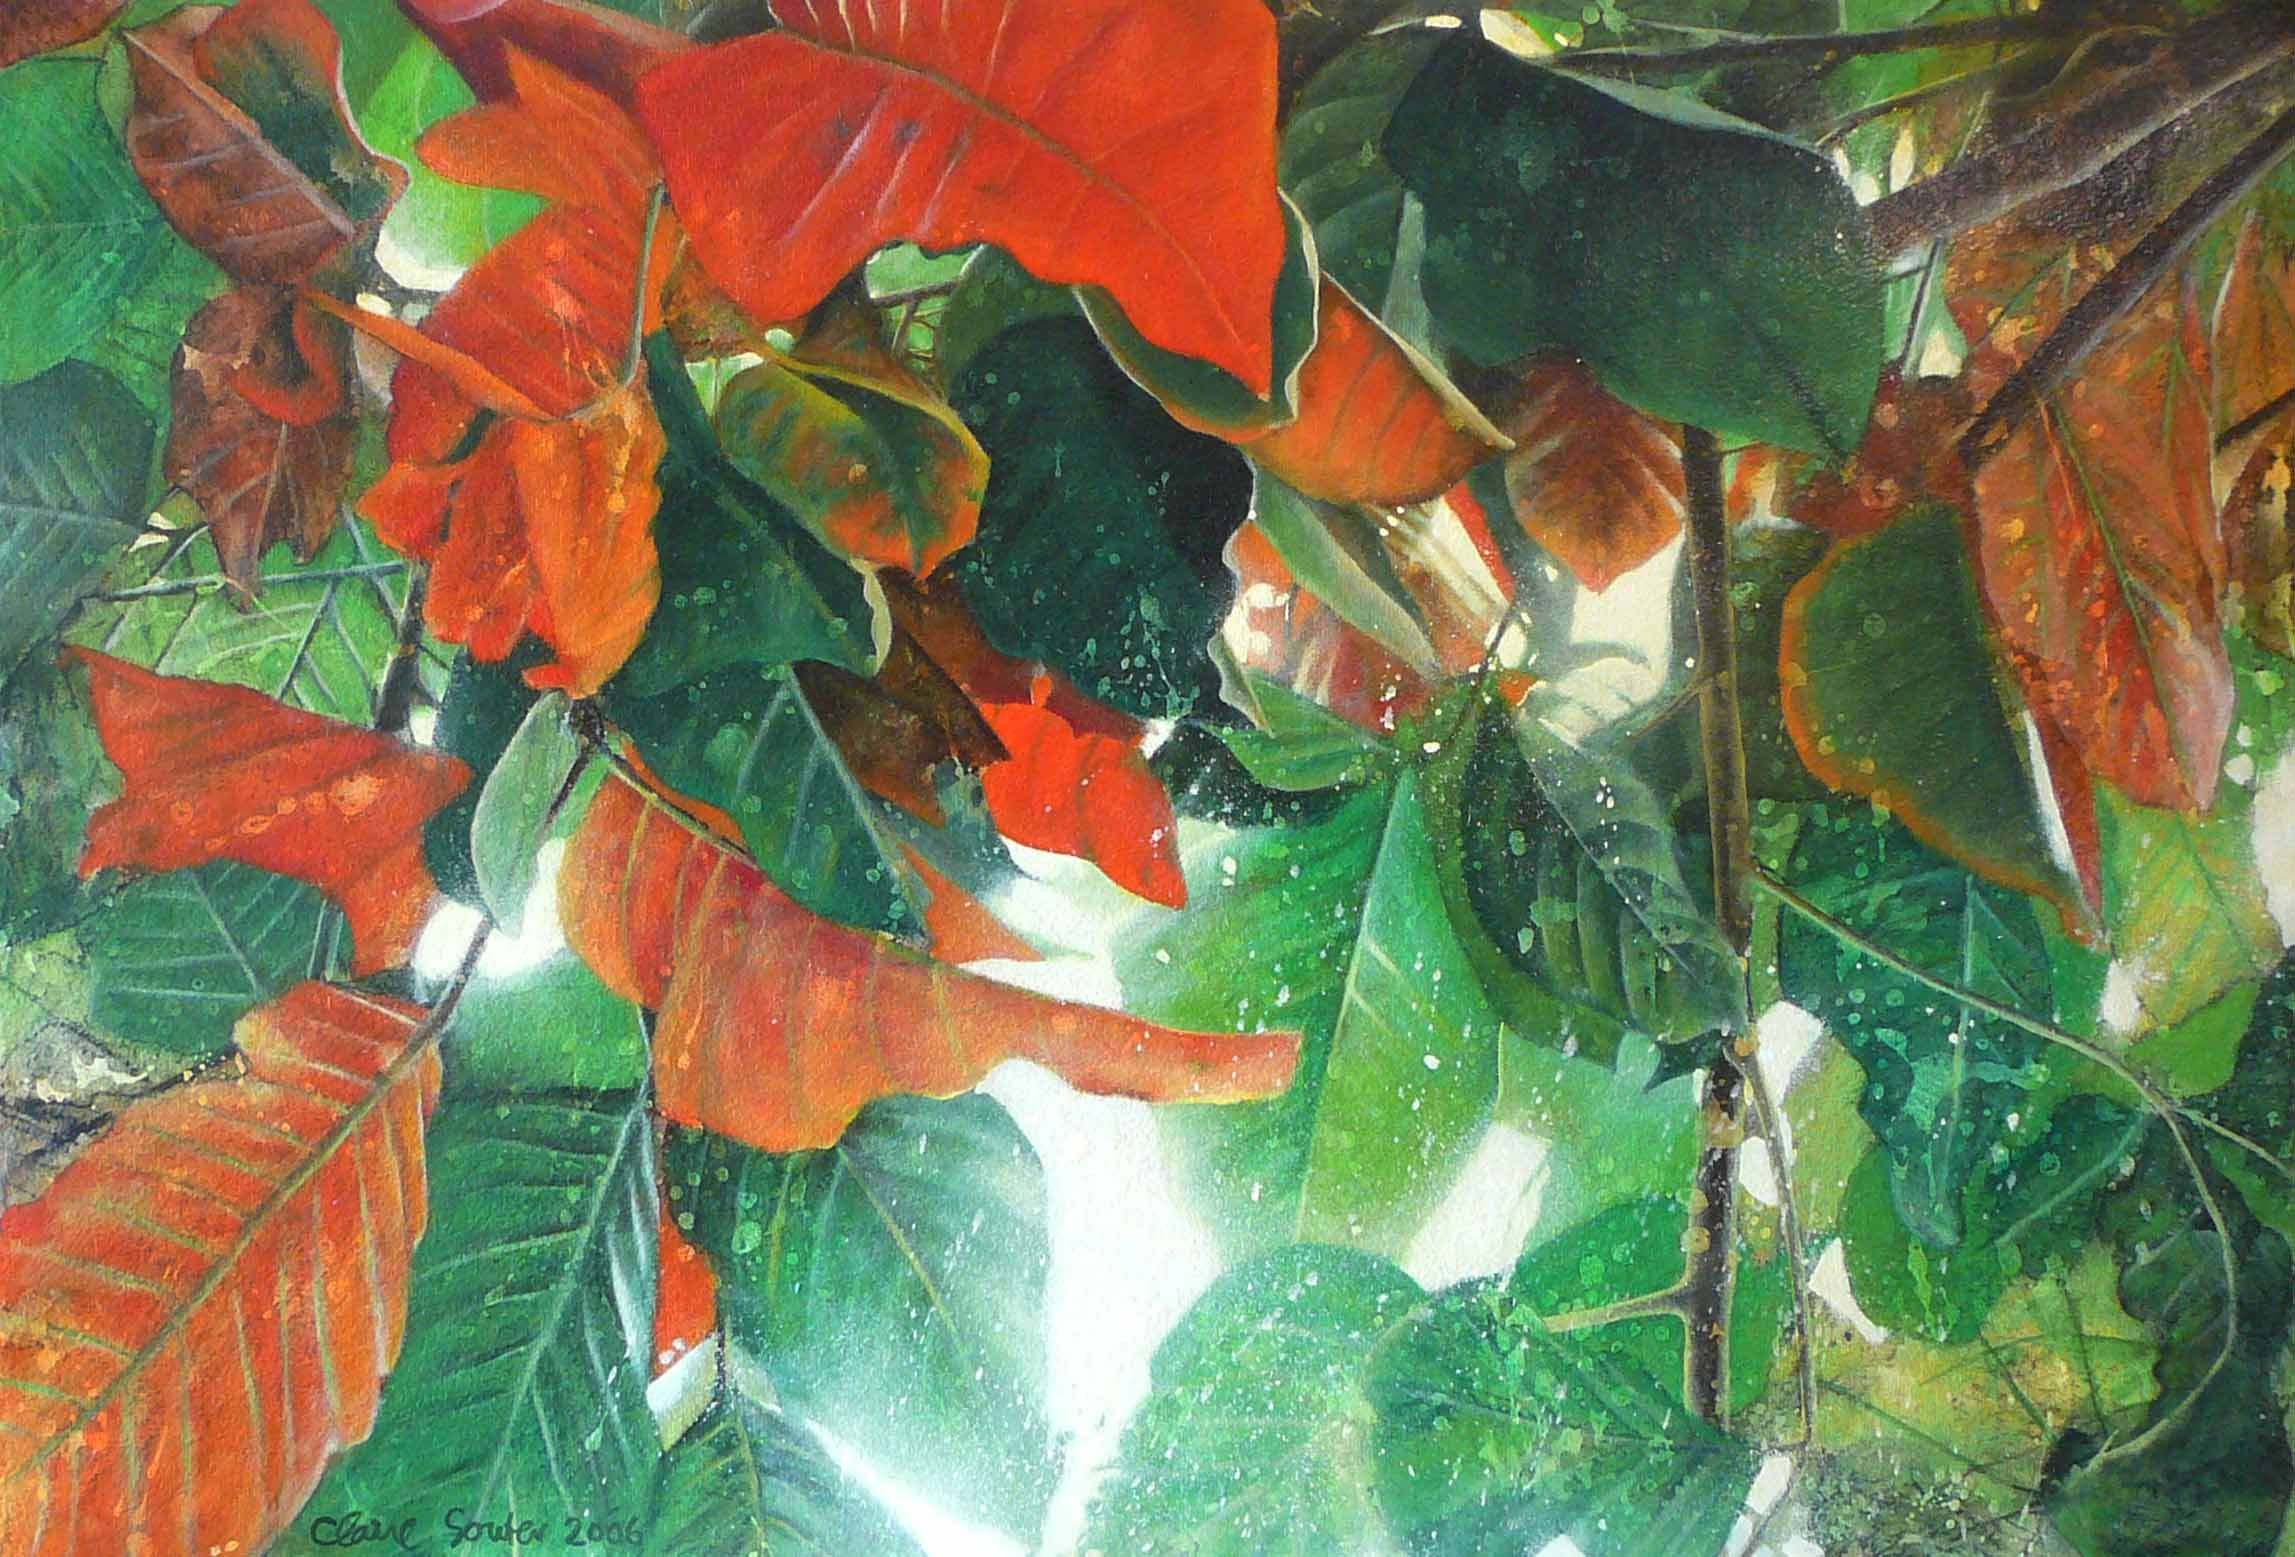 splash of santol leaves